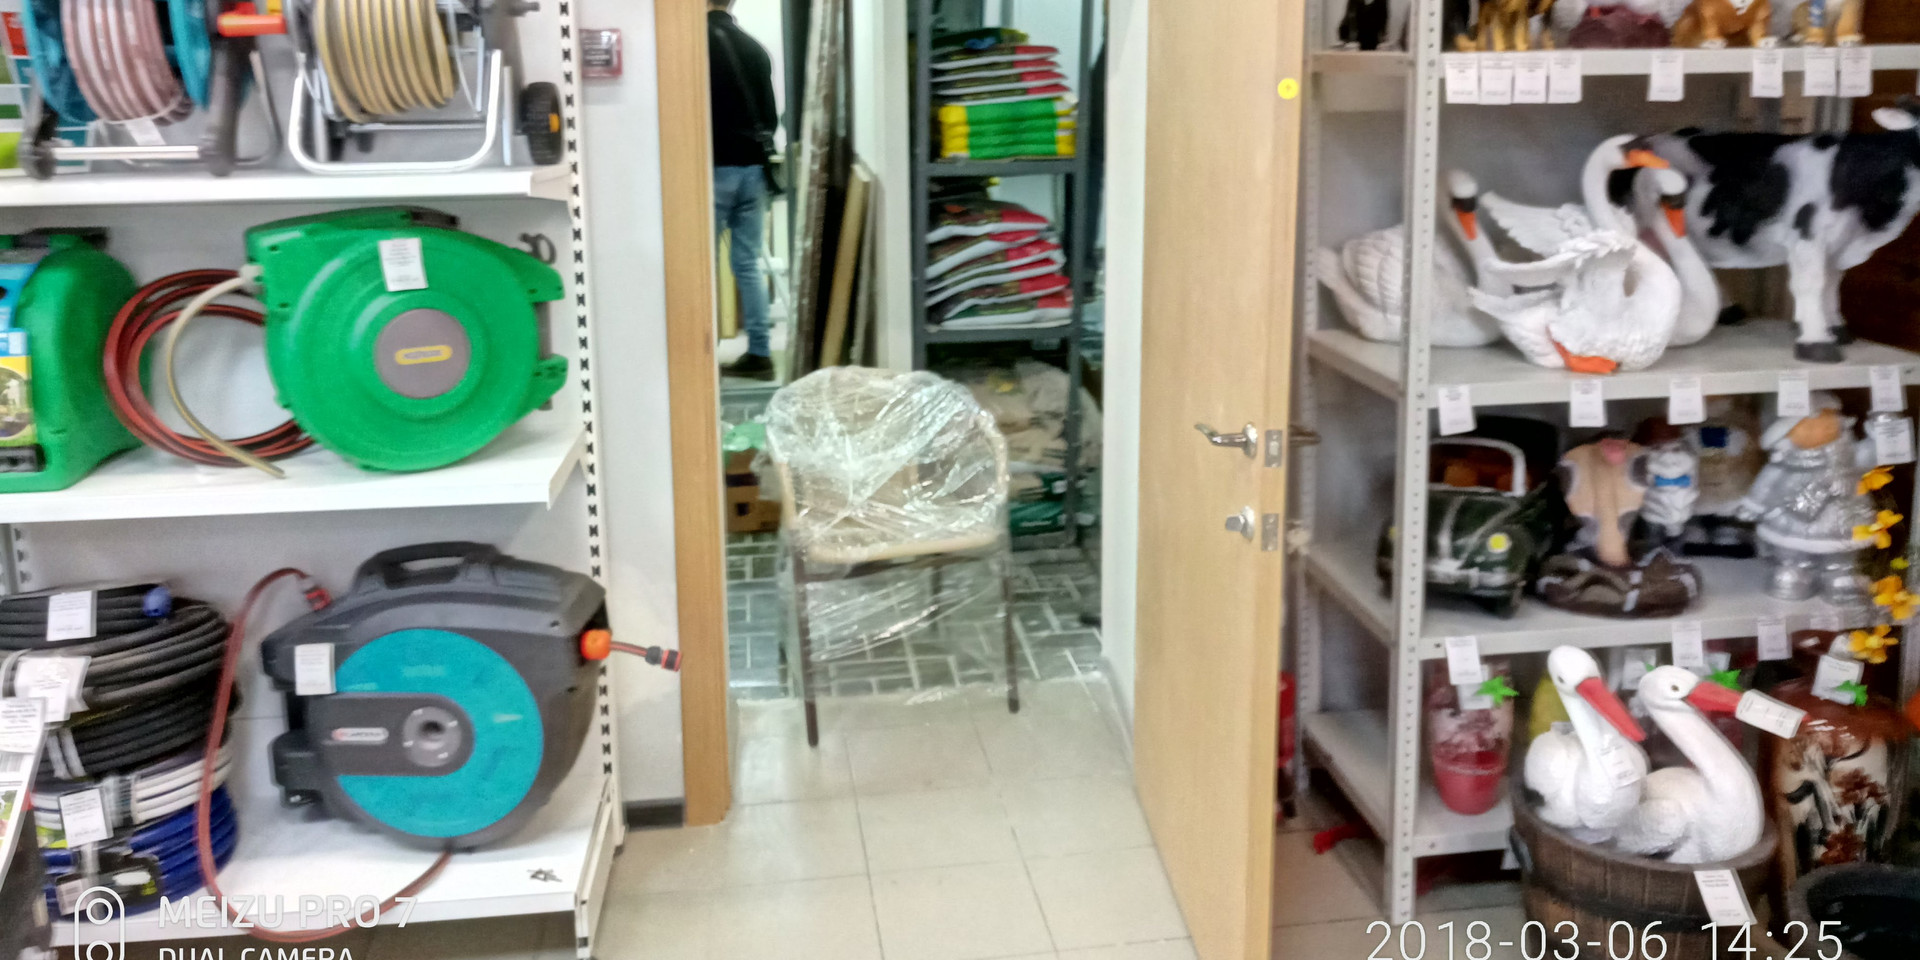 Ремонт магазинов владивосток, ремонт бут